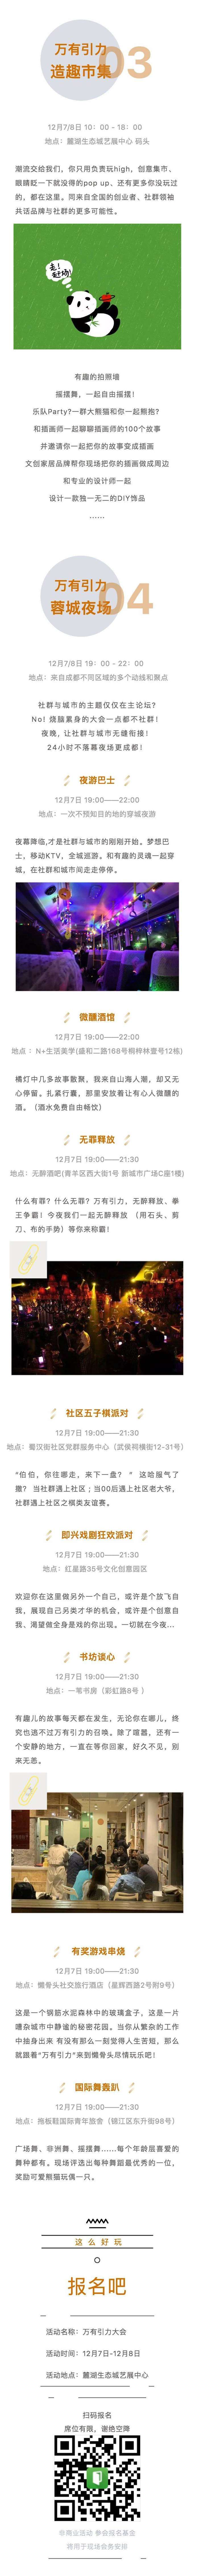 20191128_1738_yiban_screenshot.png